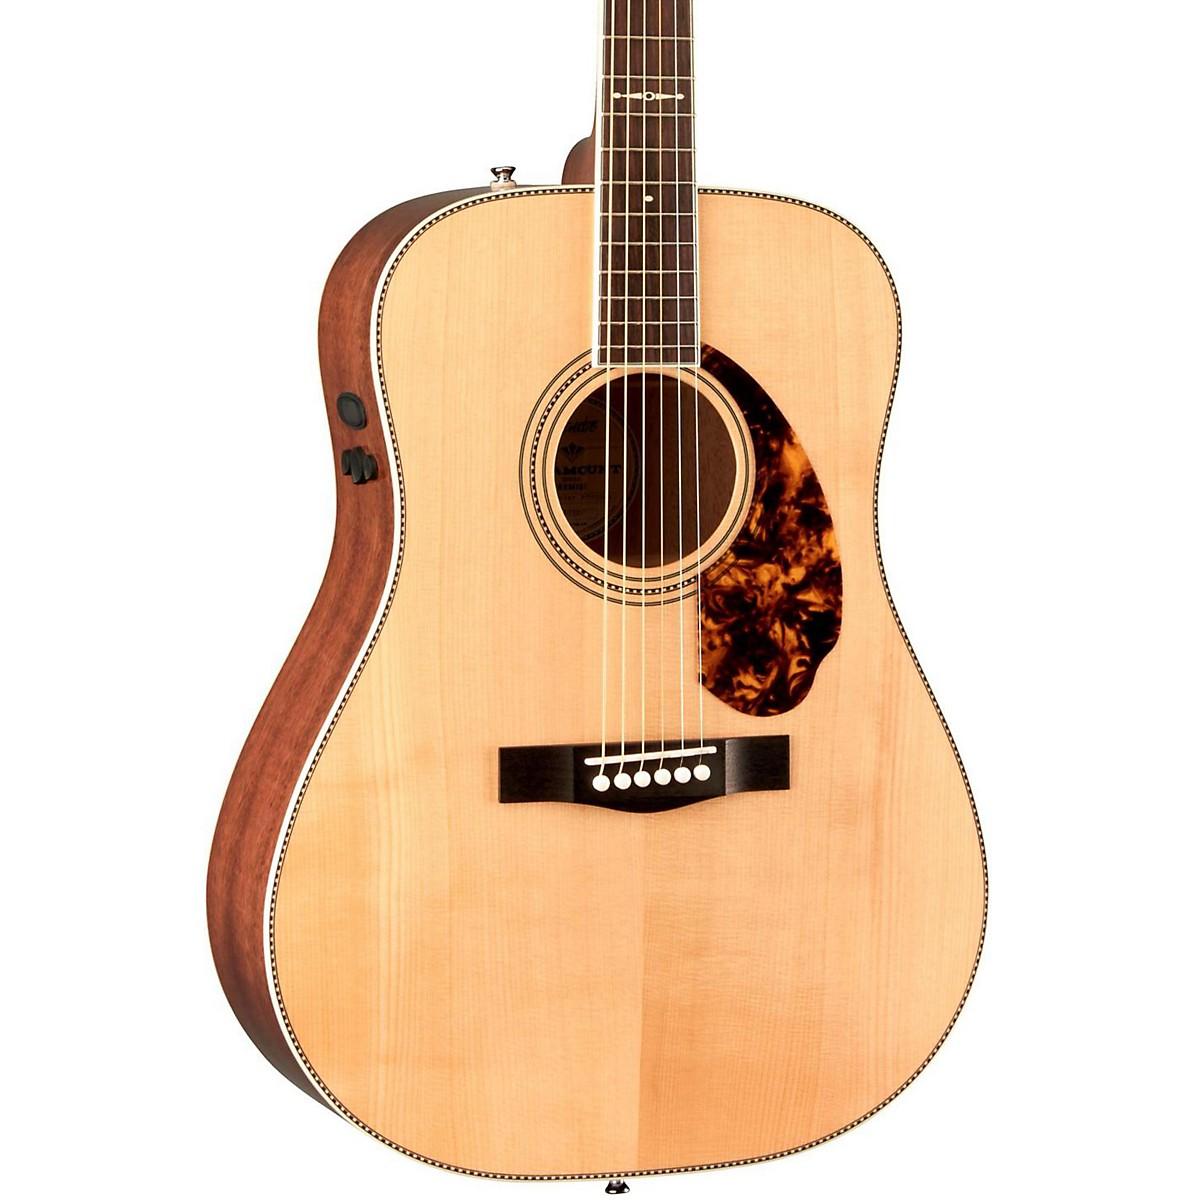 Fender Paramount Series PM-1 Limited Adirondack Dreadnought, Mahogany Acoustic-Electric Guitar